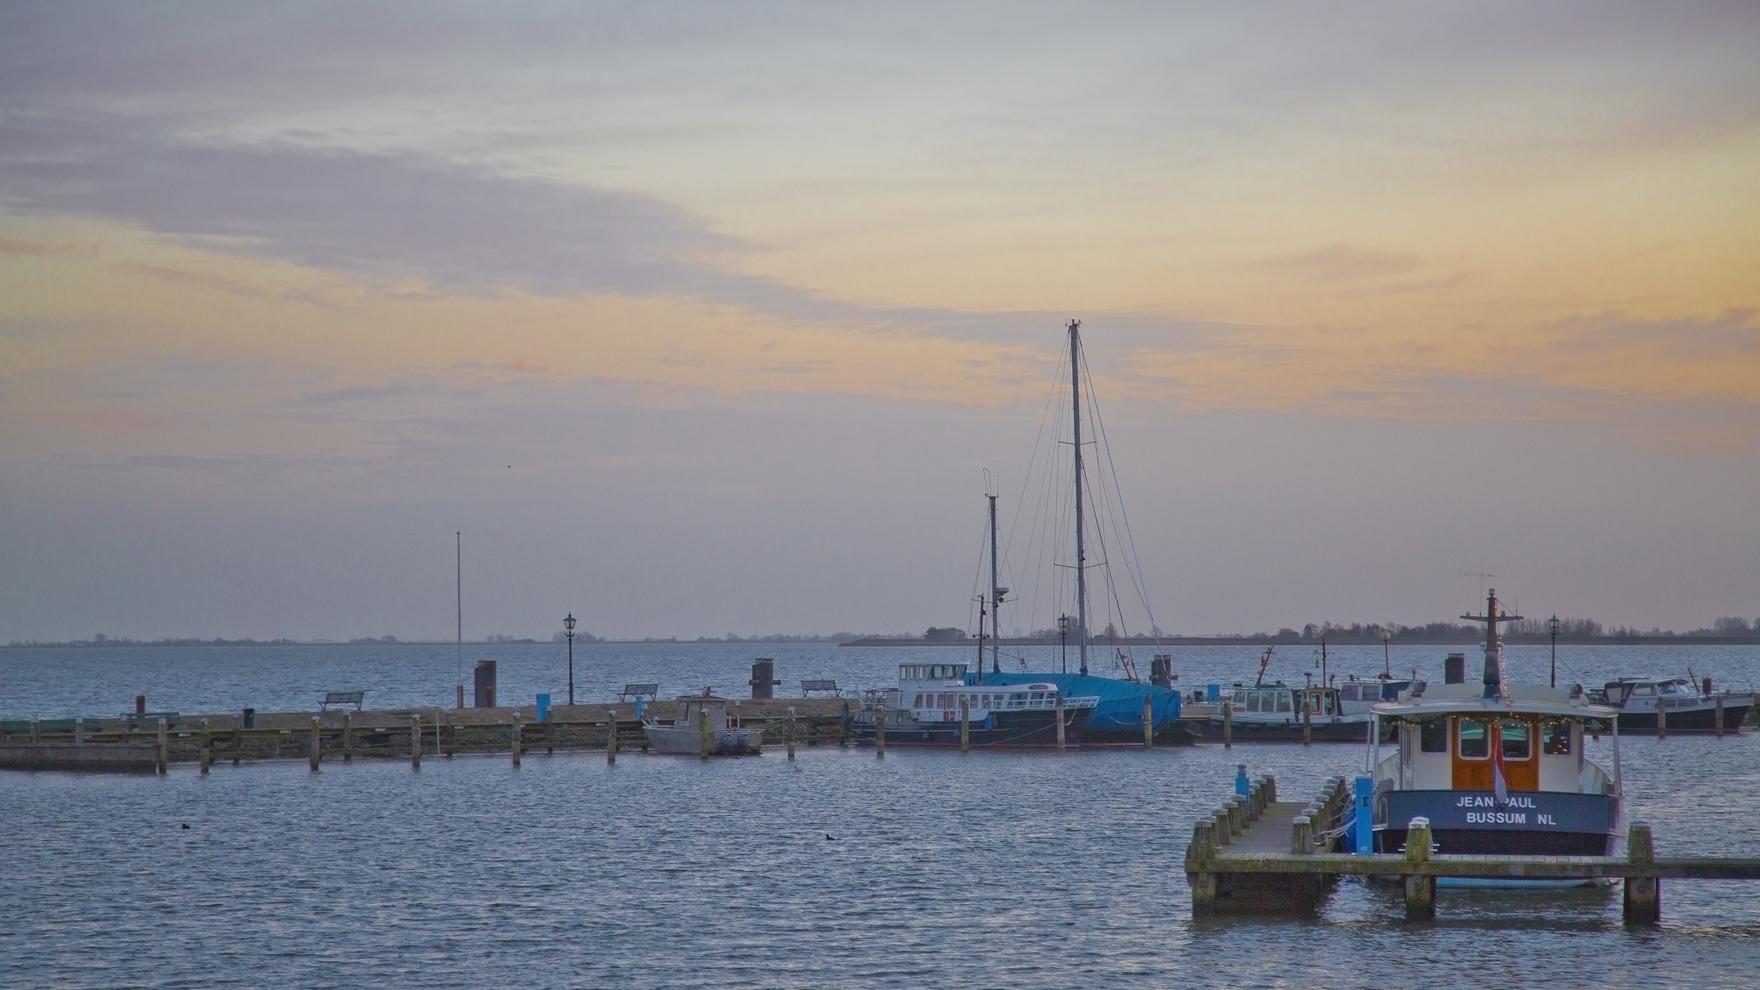 Volendam Harbor which is just north of Amsterdam.